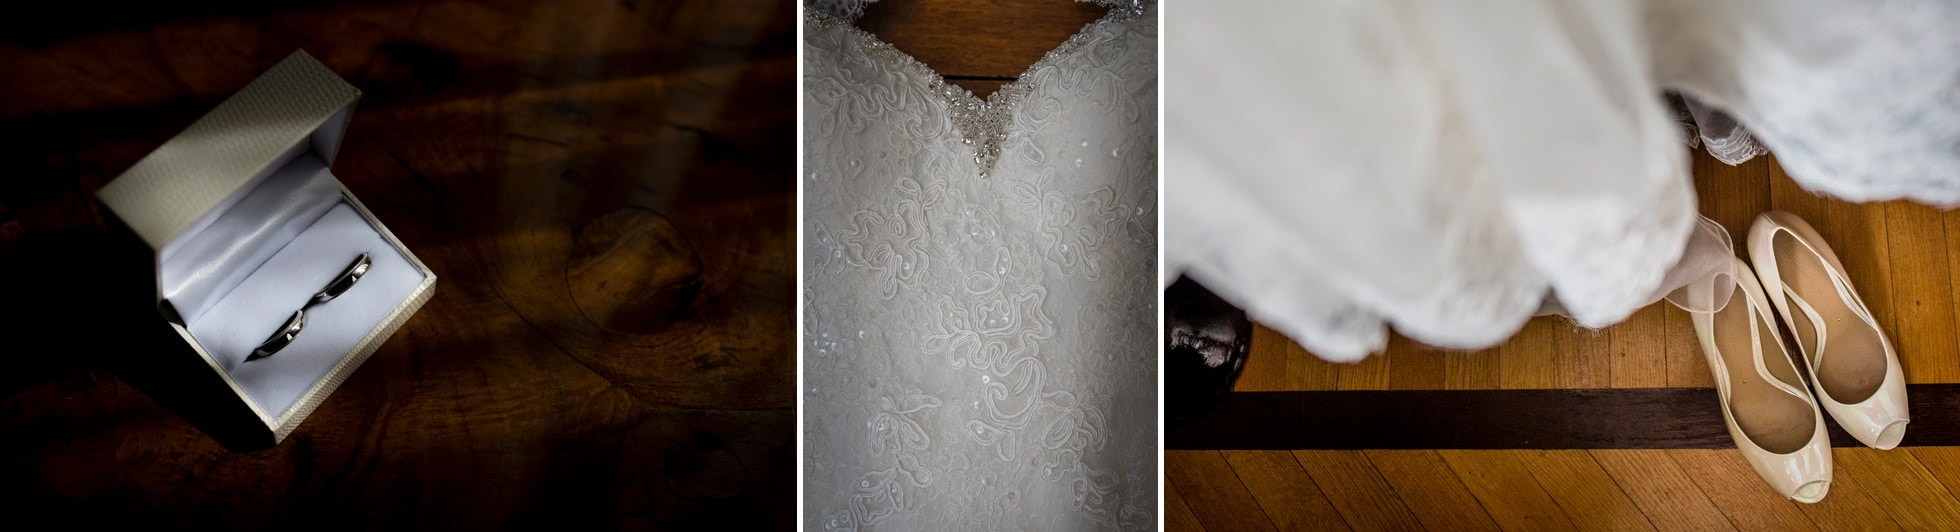 Fotografo matrimonio venezia danieli